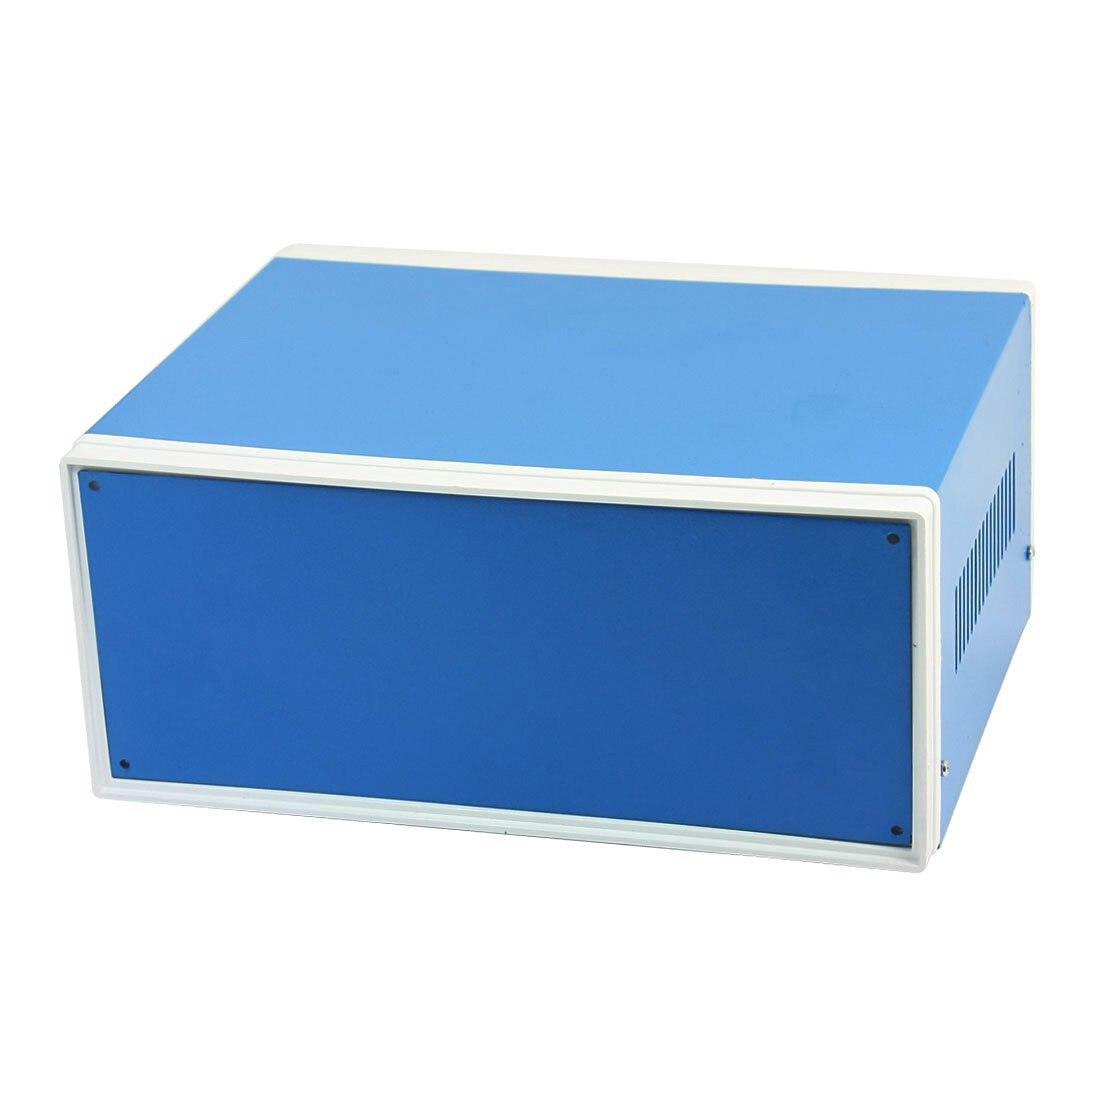 цена на 9.8 x 7.5 x 4.3 Blue Metal Enclosure Project Case DIY Junction Box